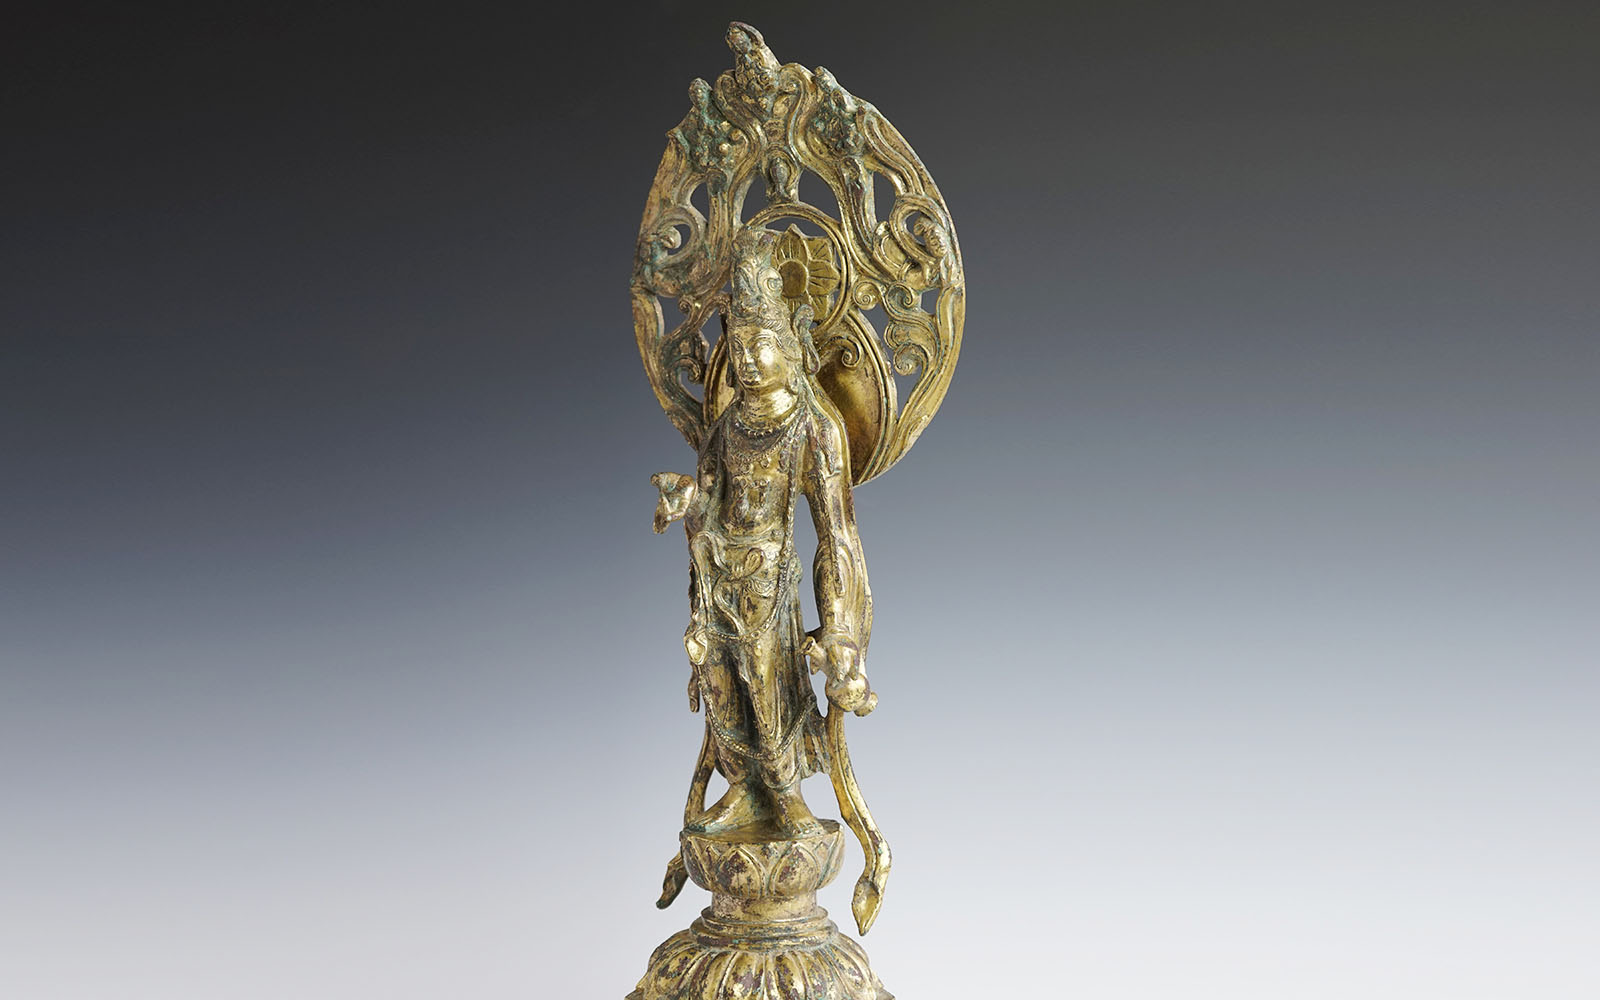 唐 銅鎏金立觀音 Gilt-bronze Avalokitesvara bodhisattva, Tang dynasty (618-907 CE), h32cm